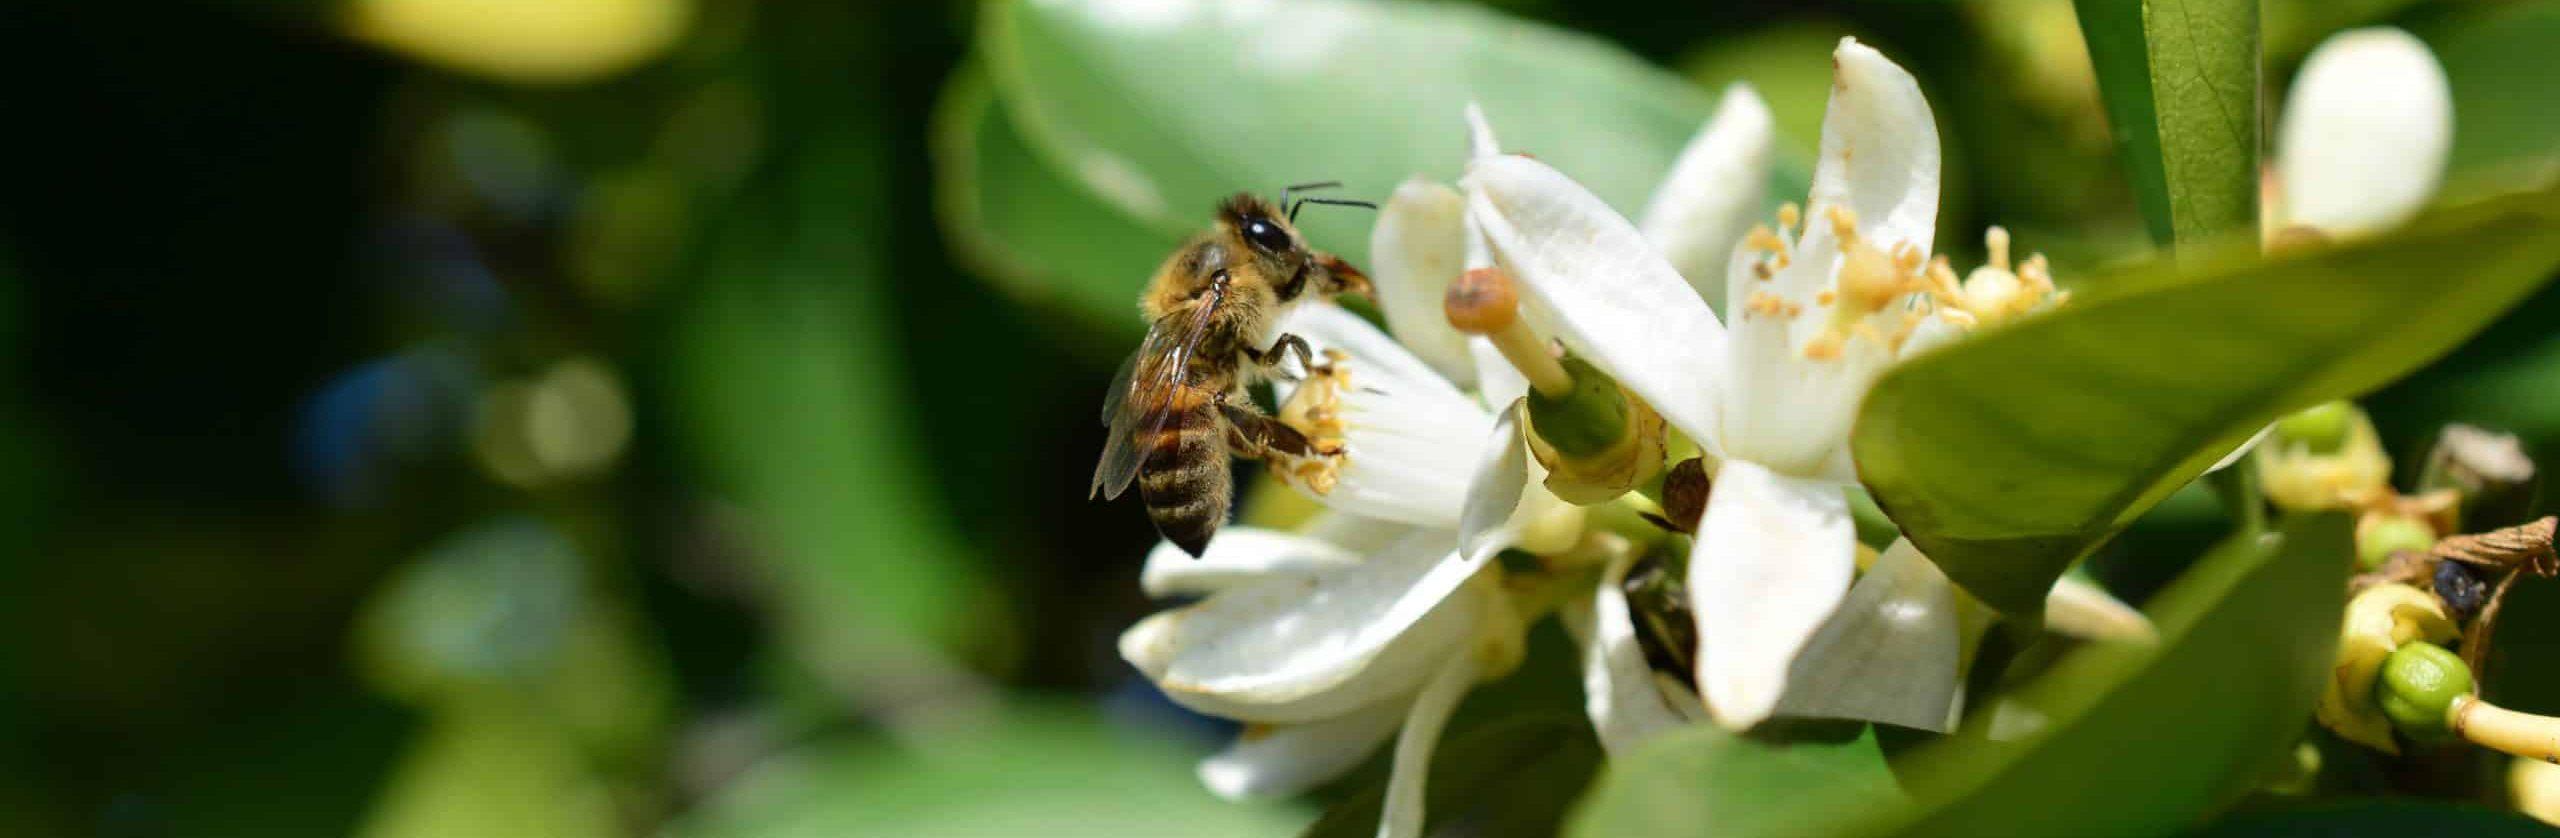 Honeybee Harvesting Orangeblossom